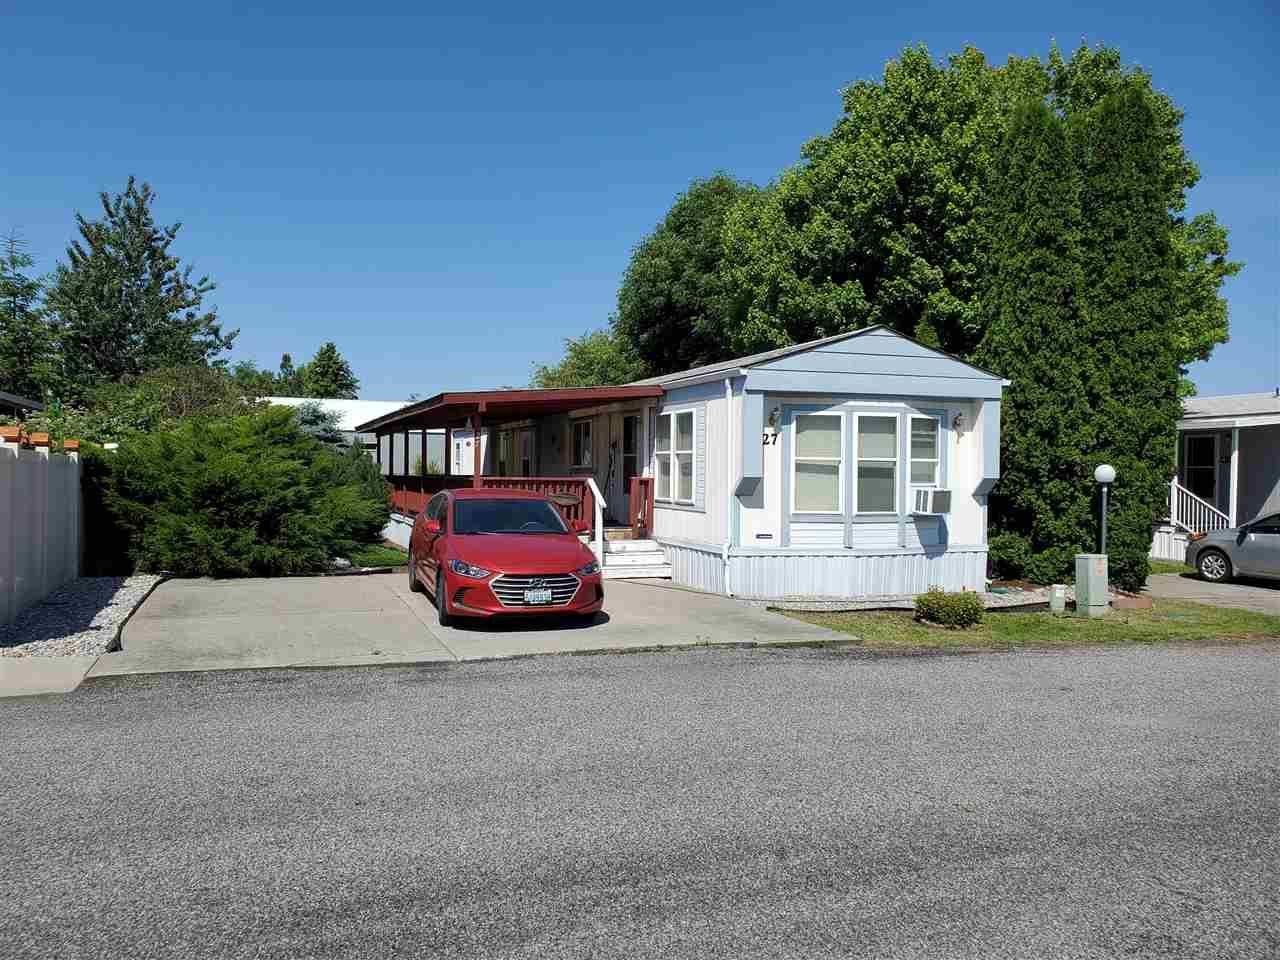 19029 E BOONE  #27 Ave, Greenacres, WA 99016 - #: 202018350